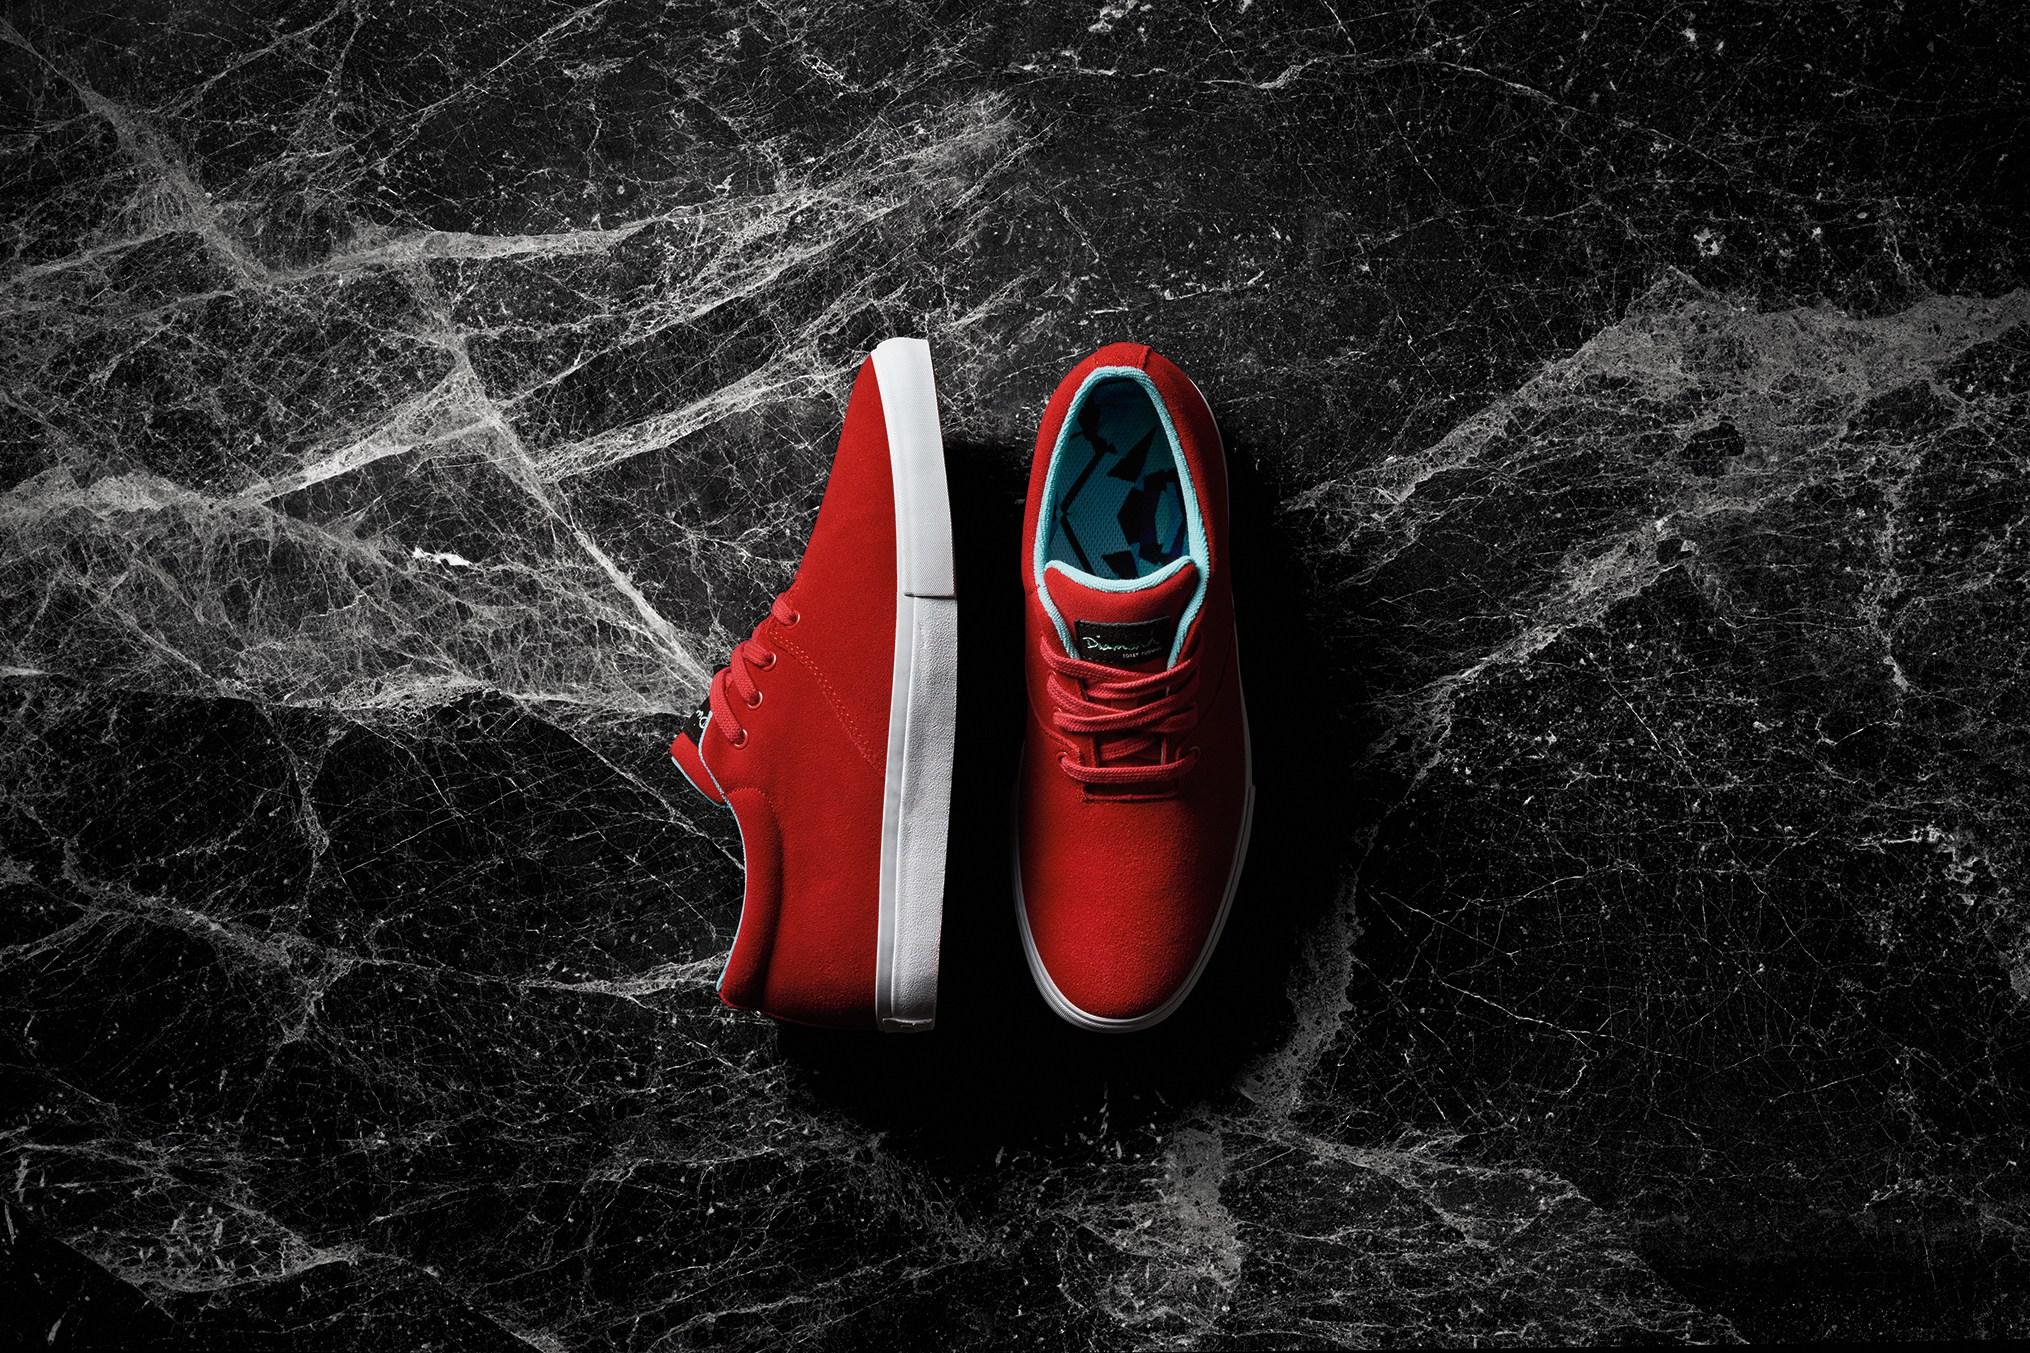 diamond-supply-co-launches-footwear-8.jpg